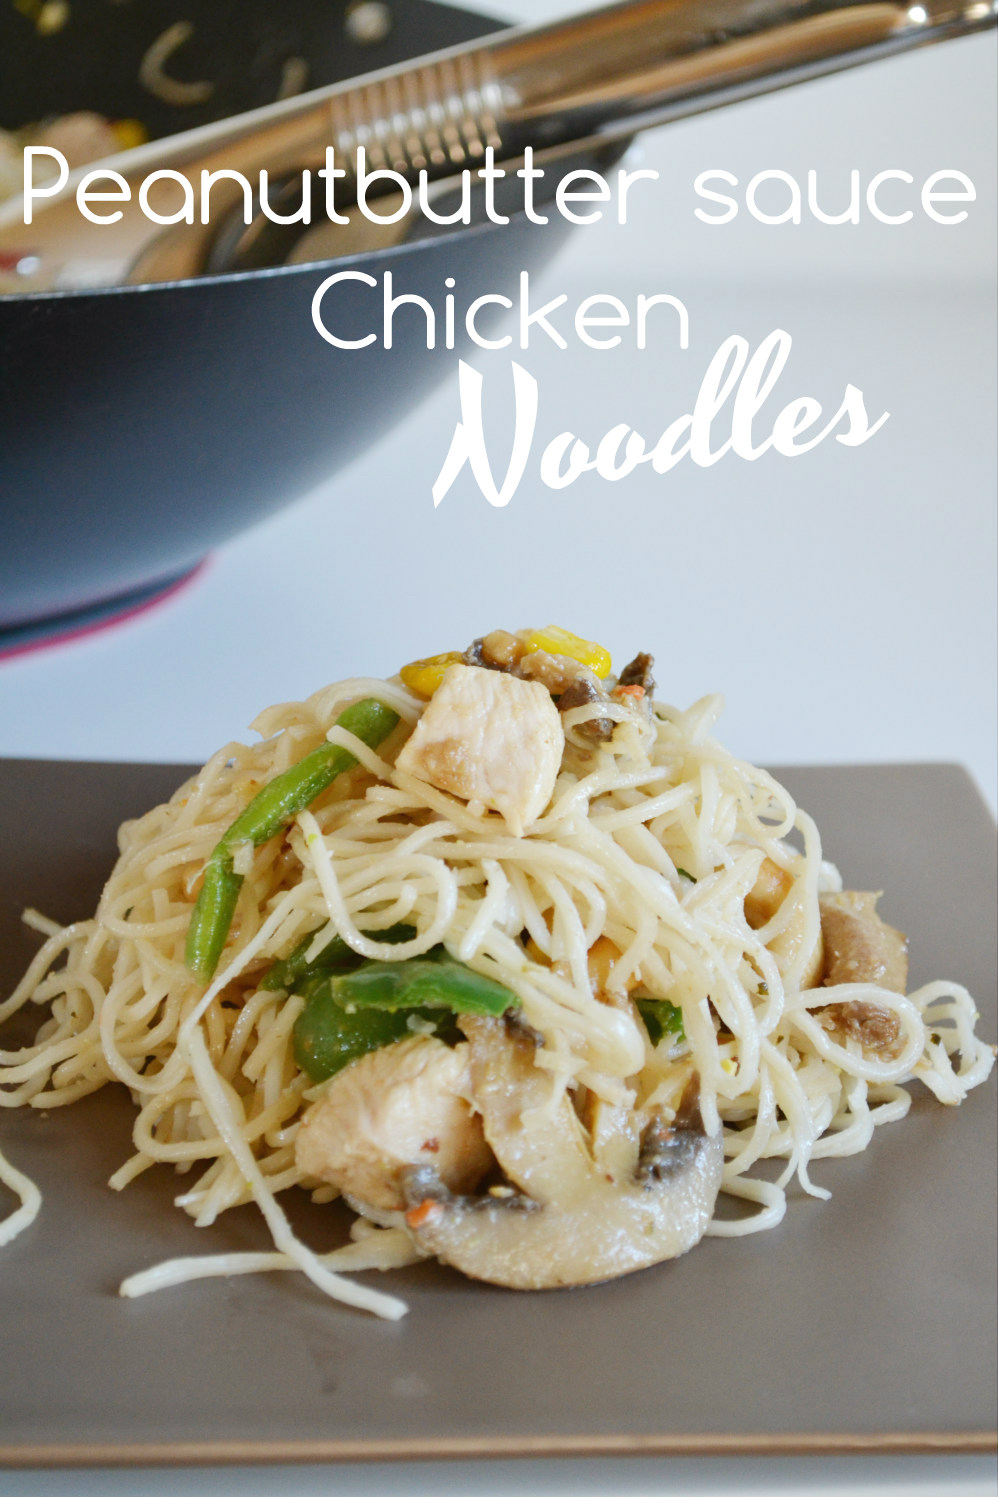 peanutbutter chicken noodles letter DSC_0072